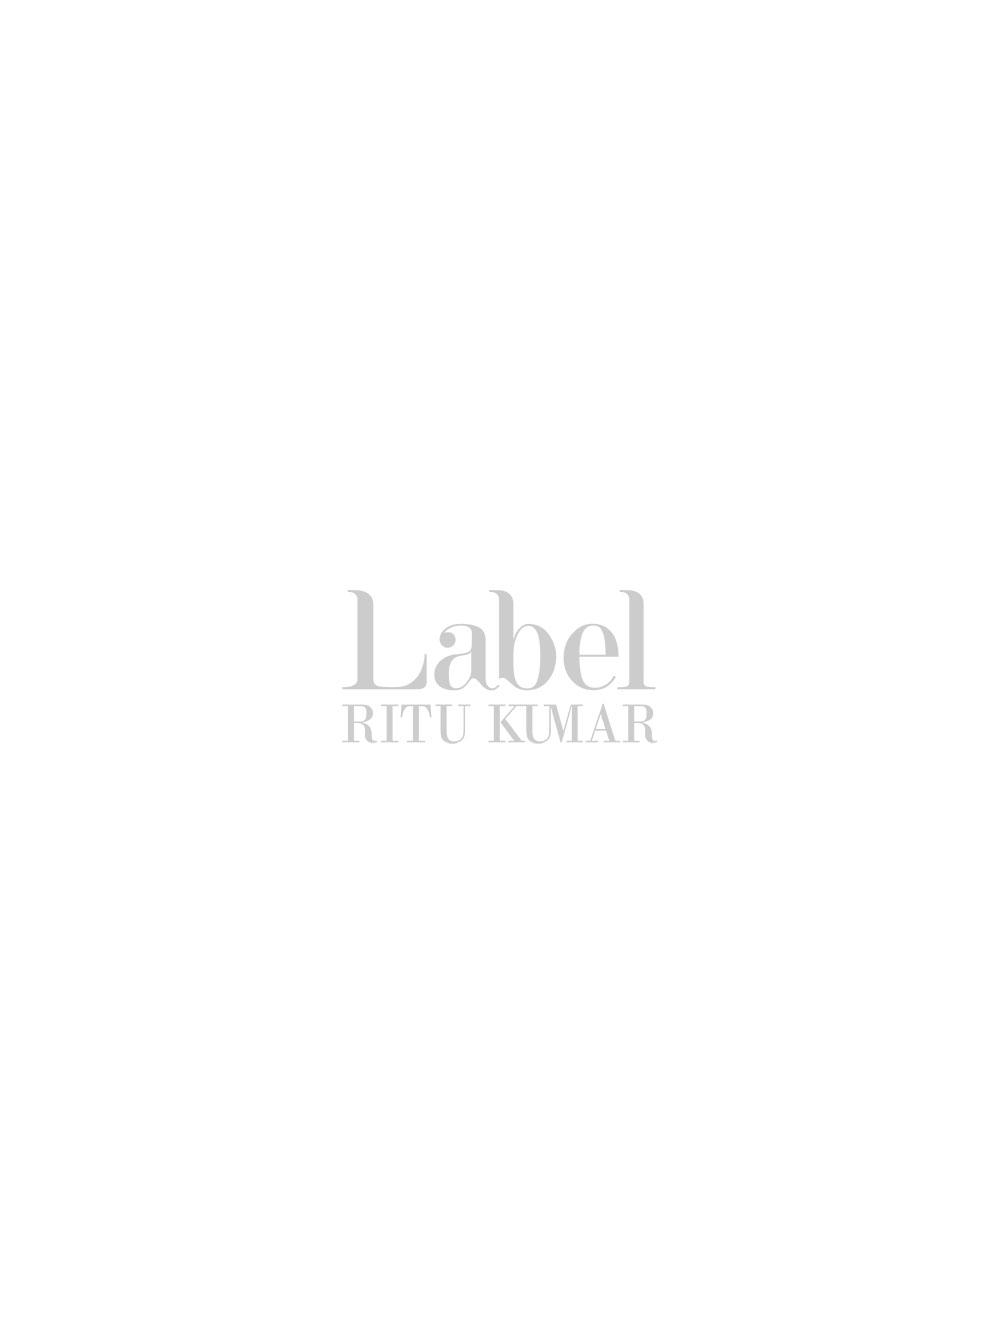 Buy Indian Designer Vaani Kapoor in a Printed Short Dress by labelritukumar  Online 5d21ae77d